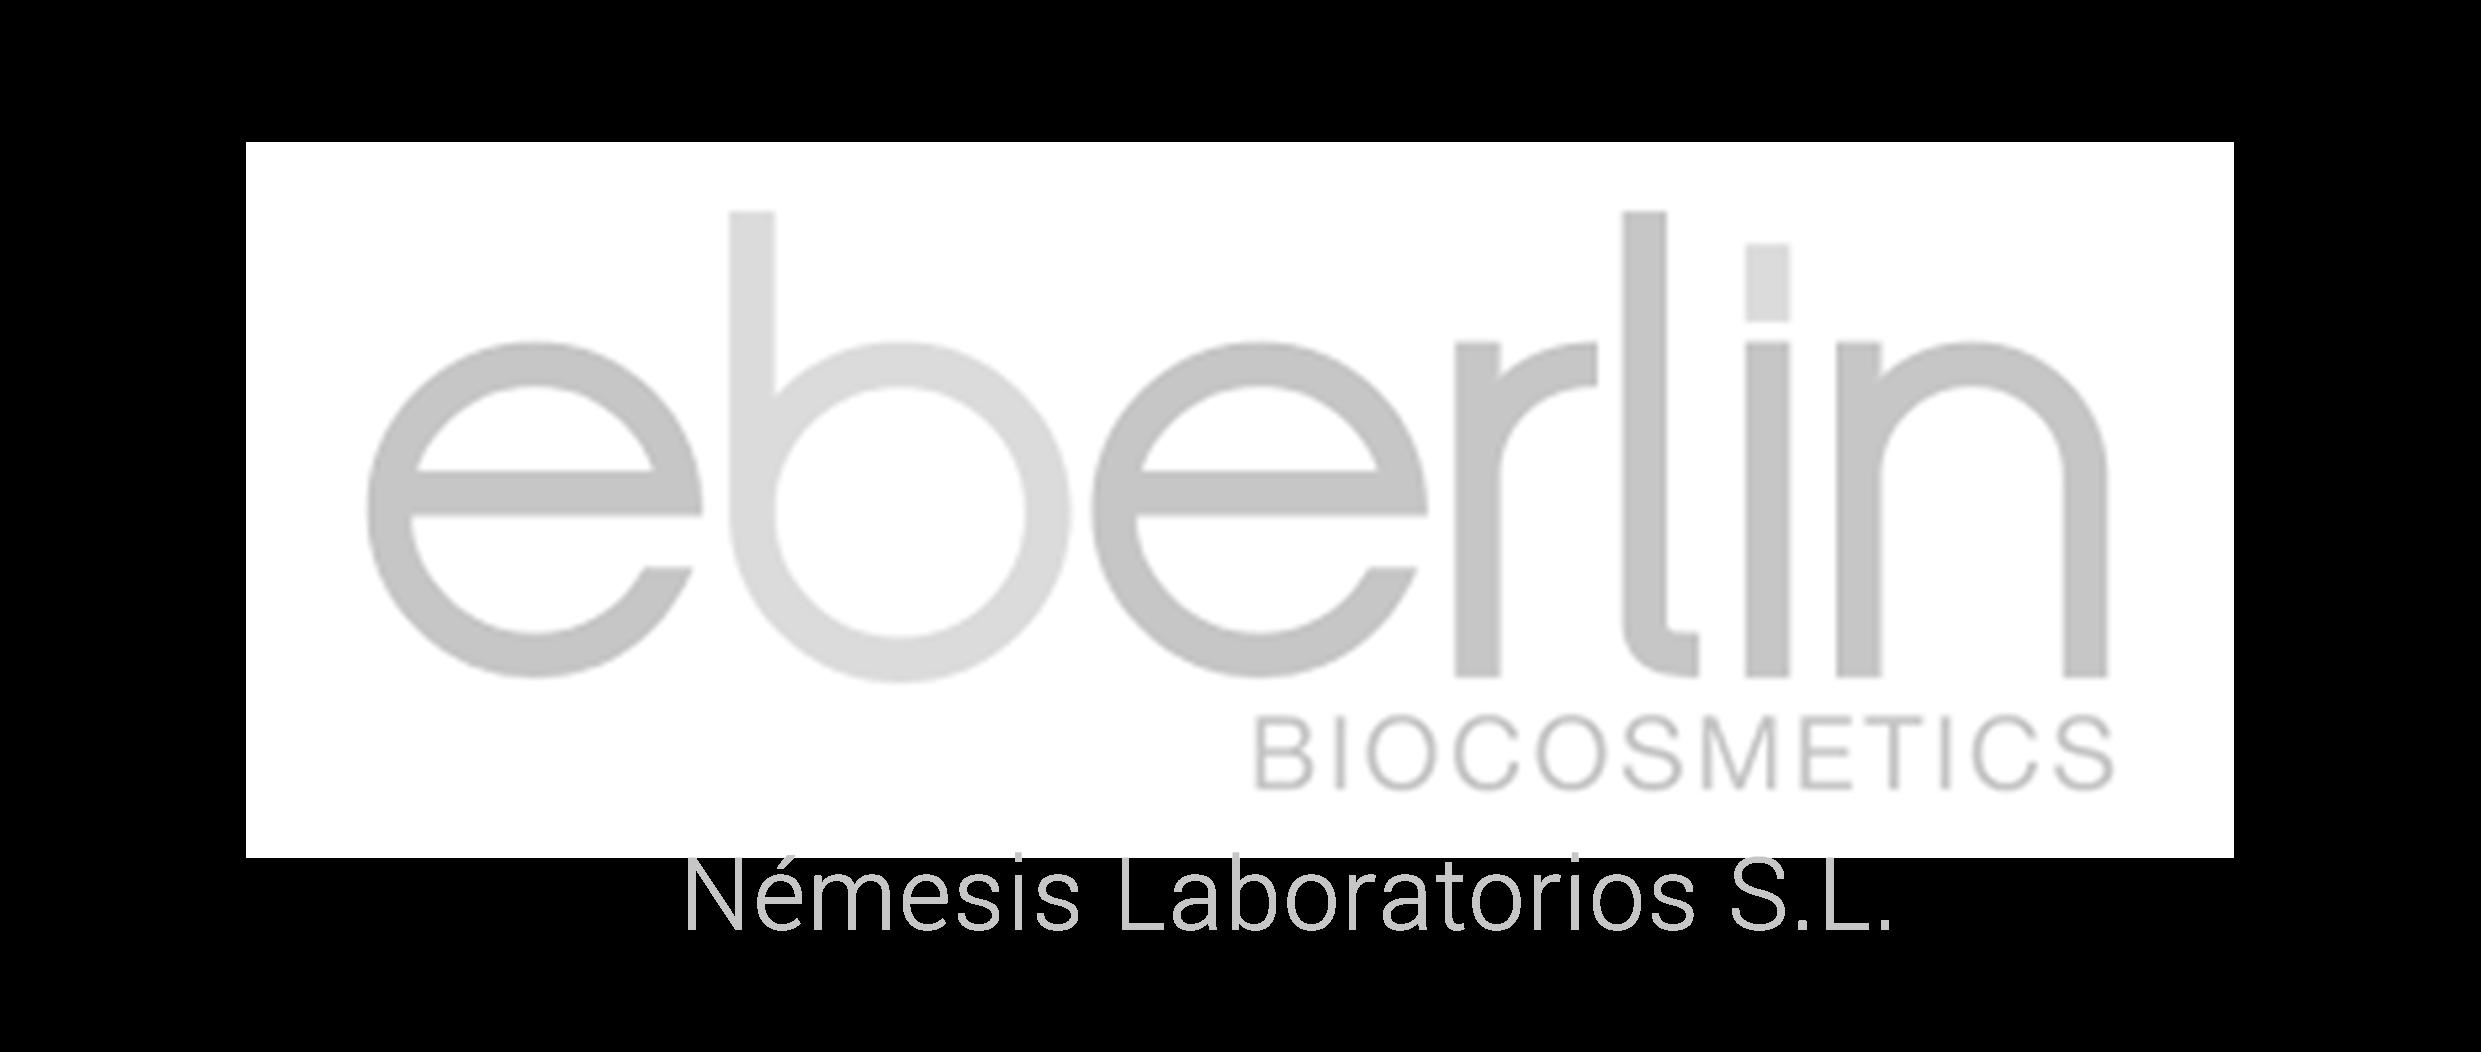 eberlin-logo